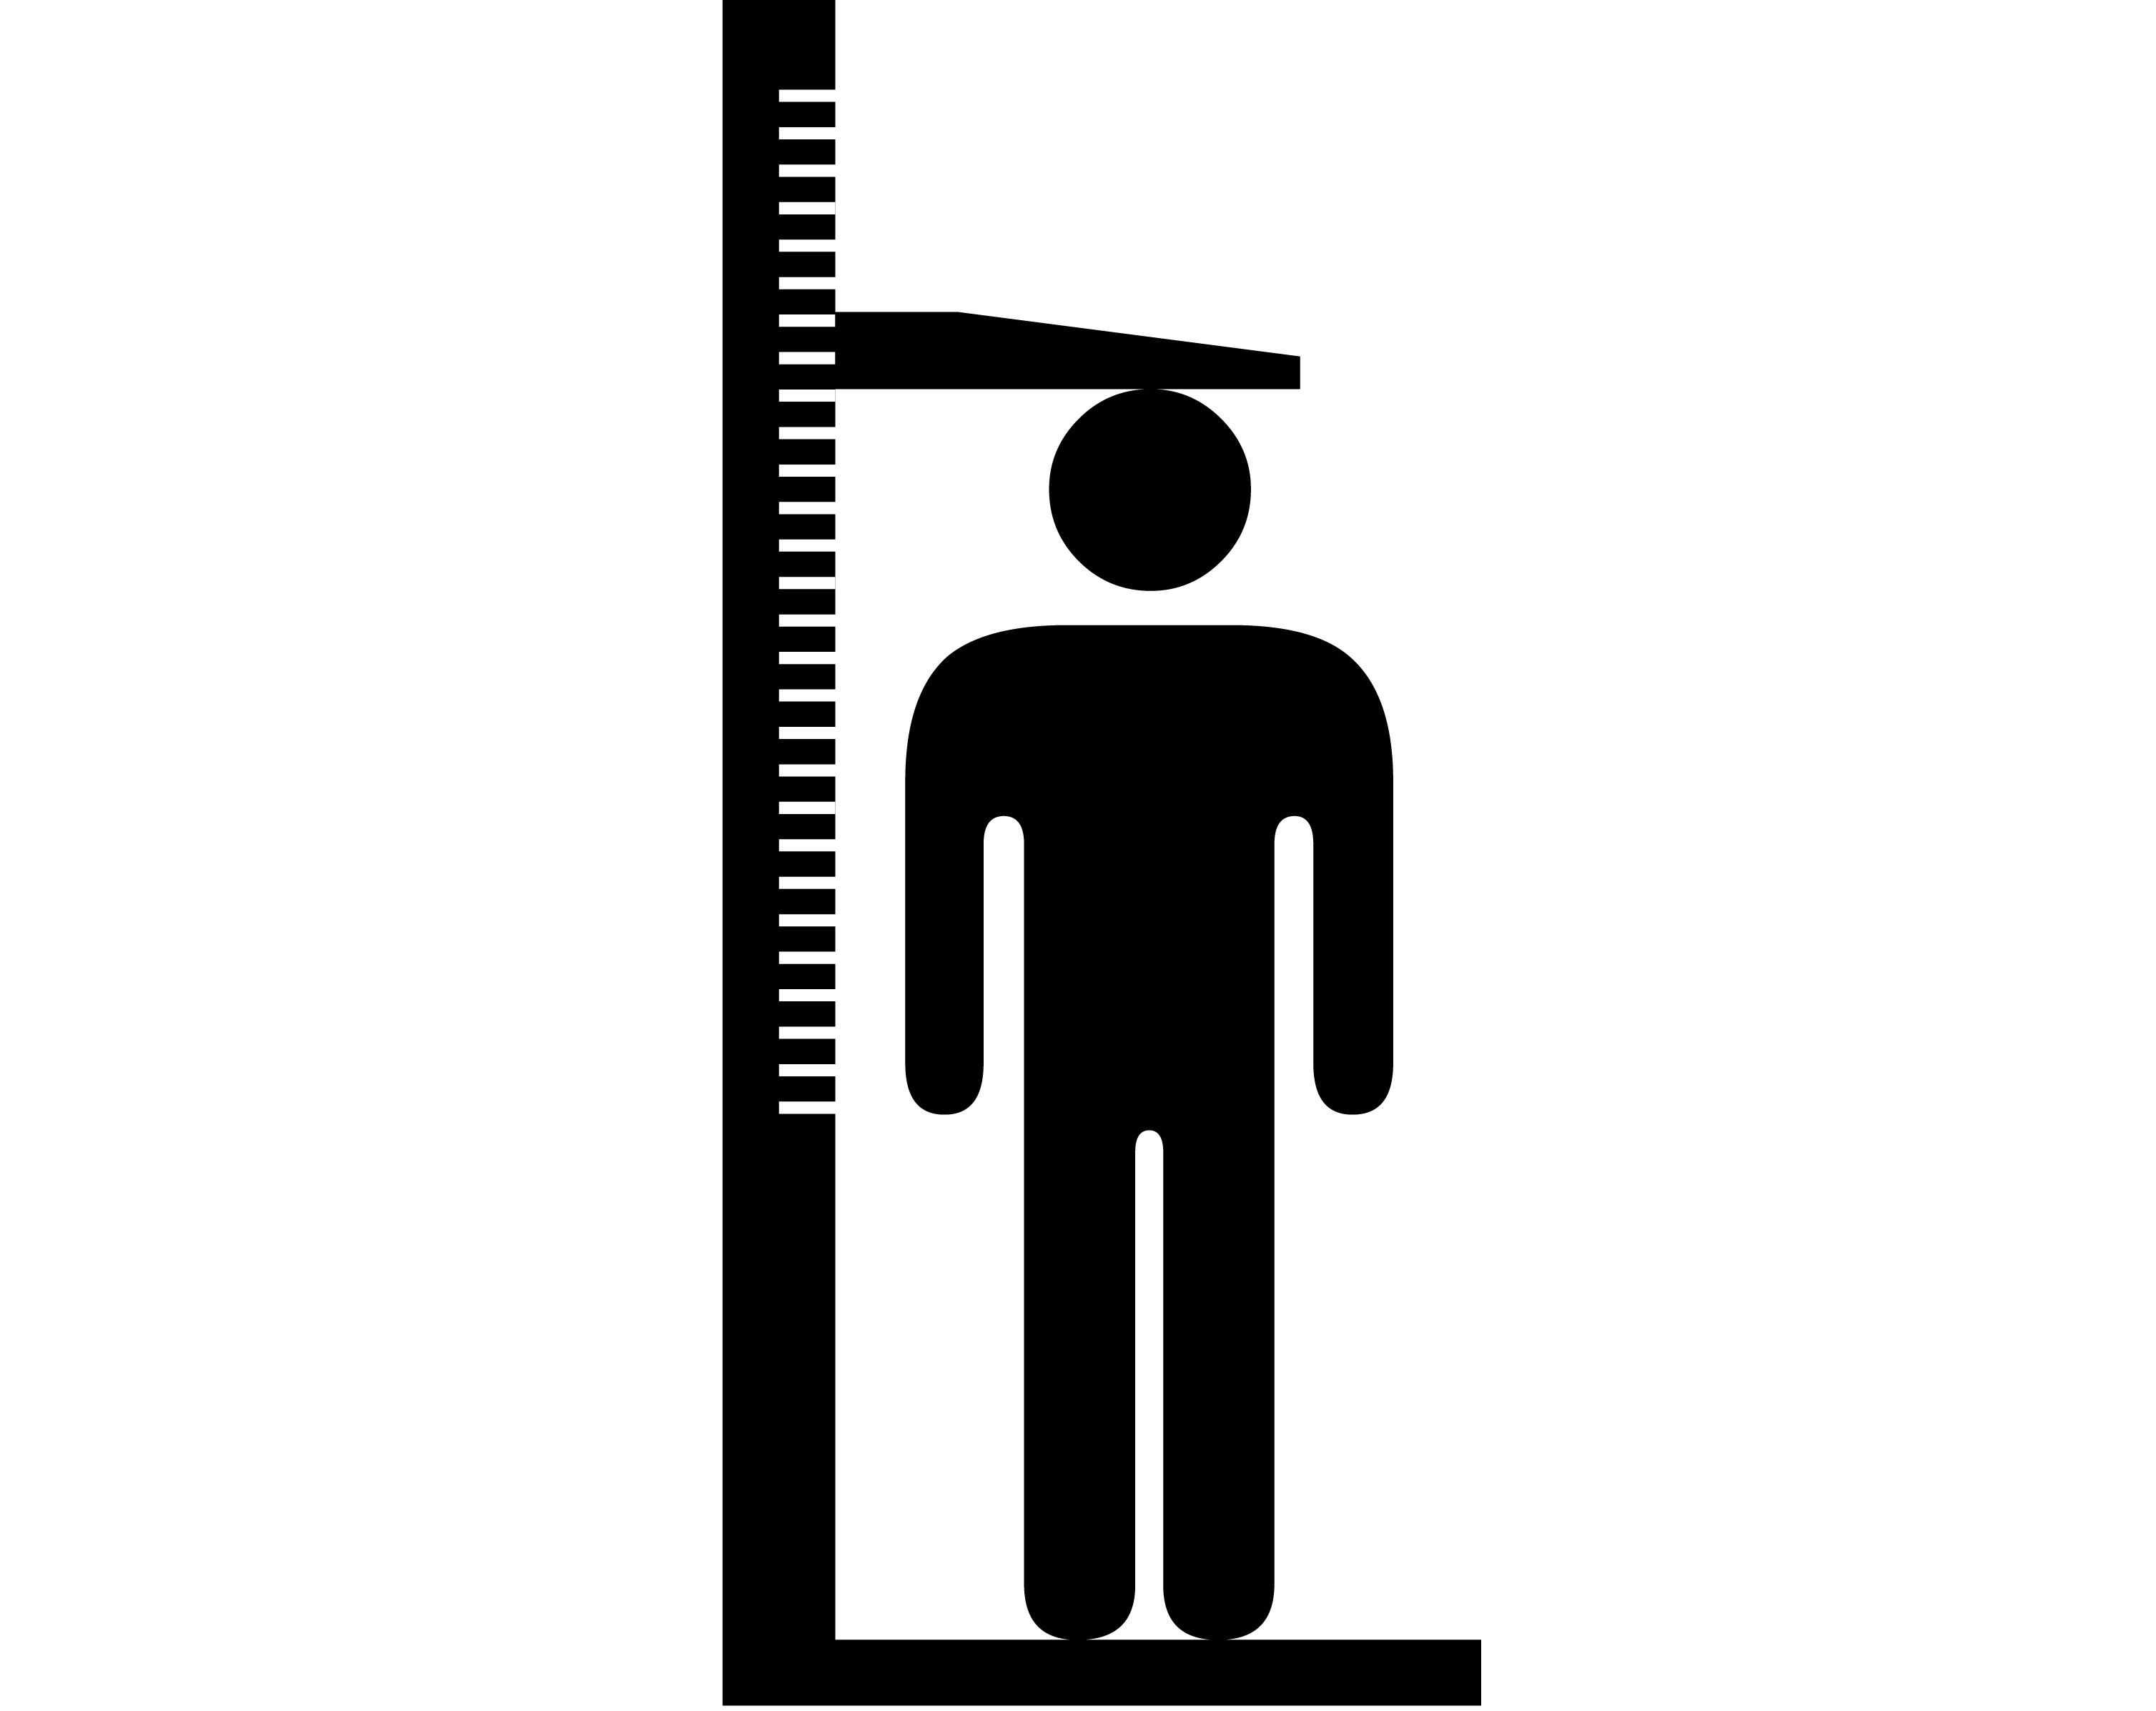 Height photo